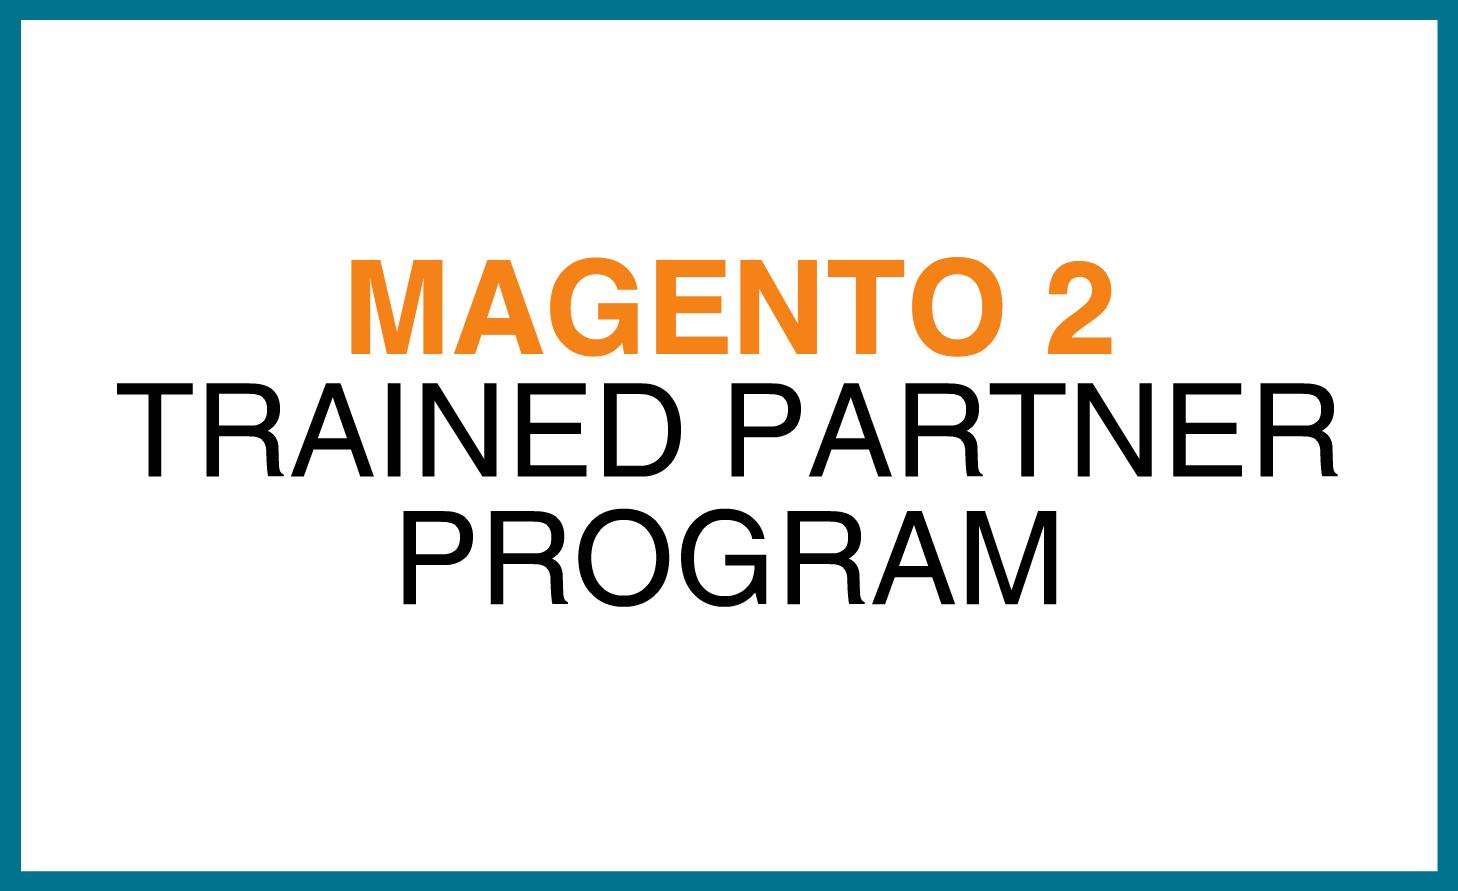 Magento 2 Trained Partner Program